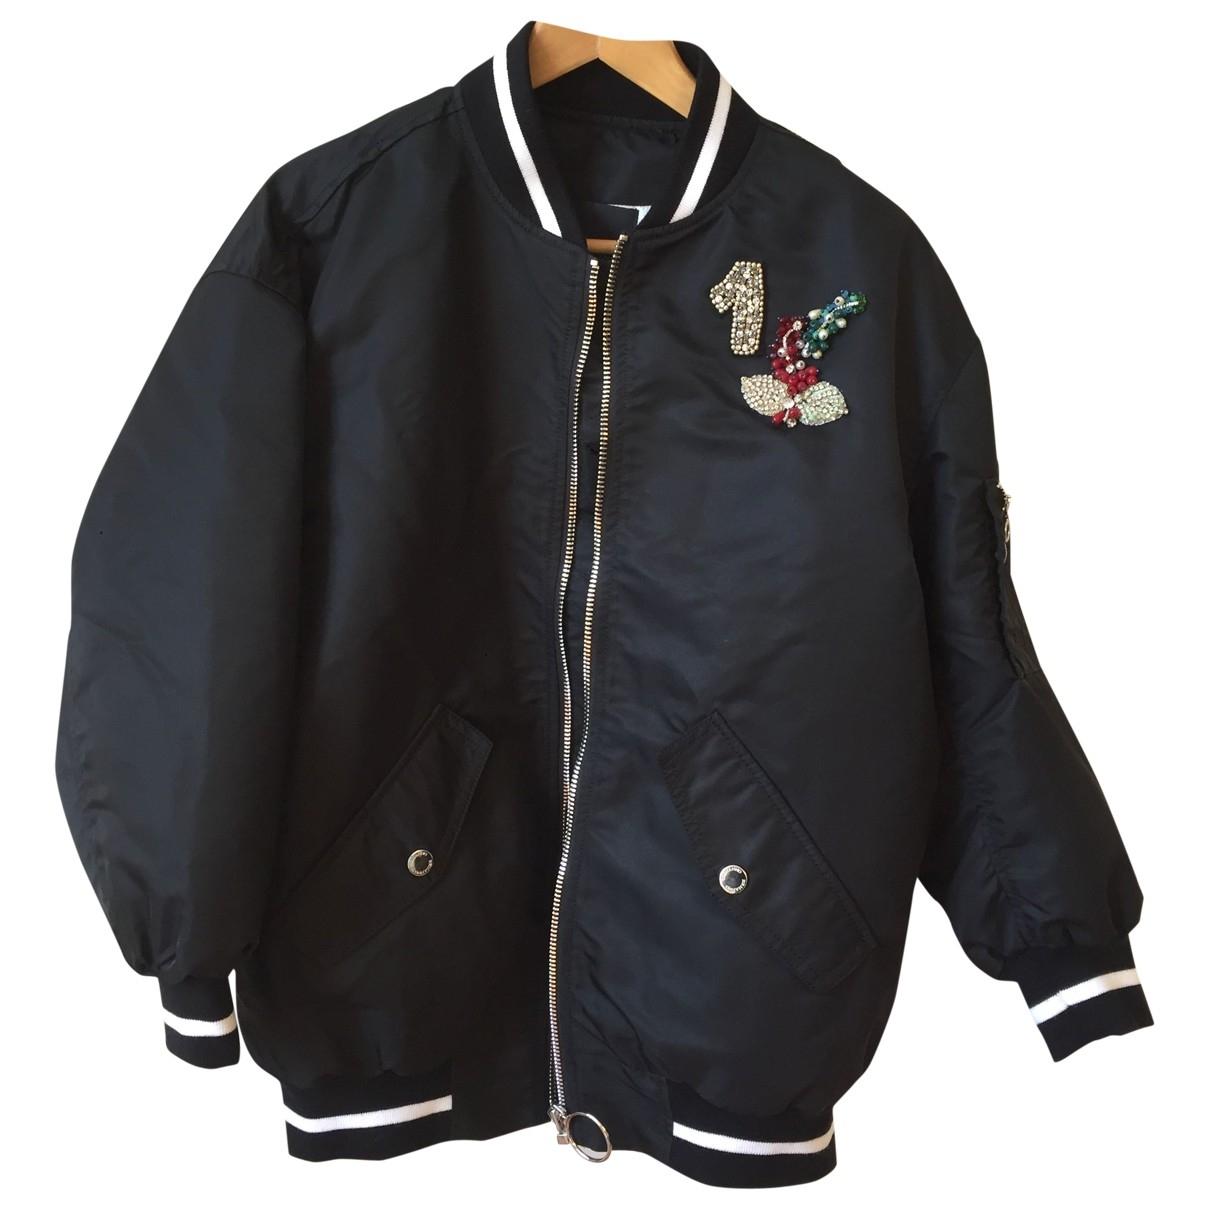 Ermanno Scervino \N Black Leather jacket for Women 38 IT